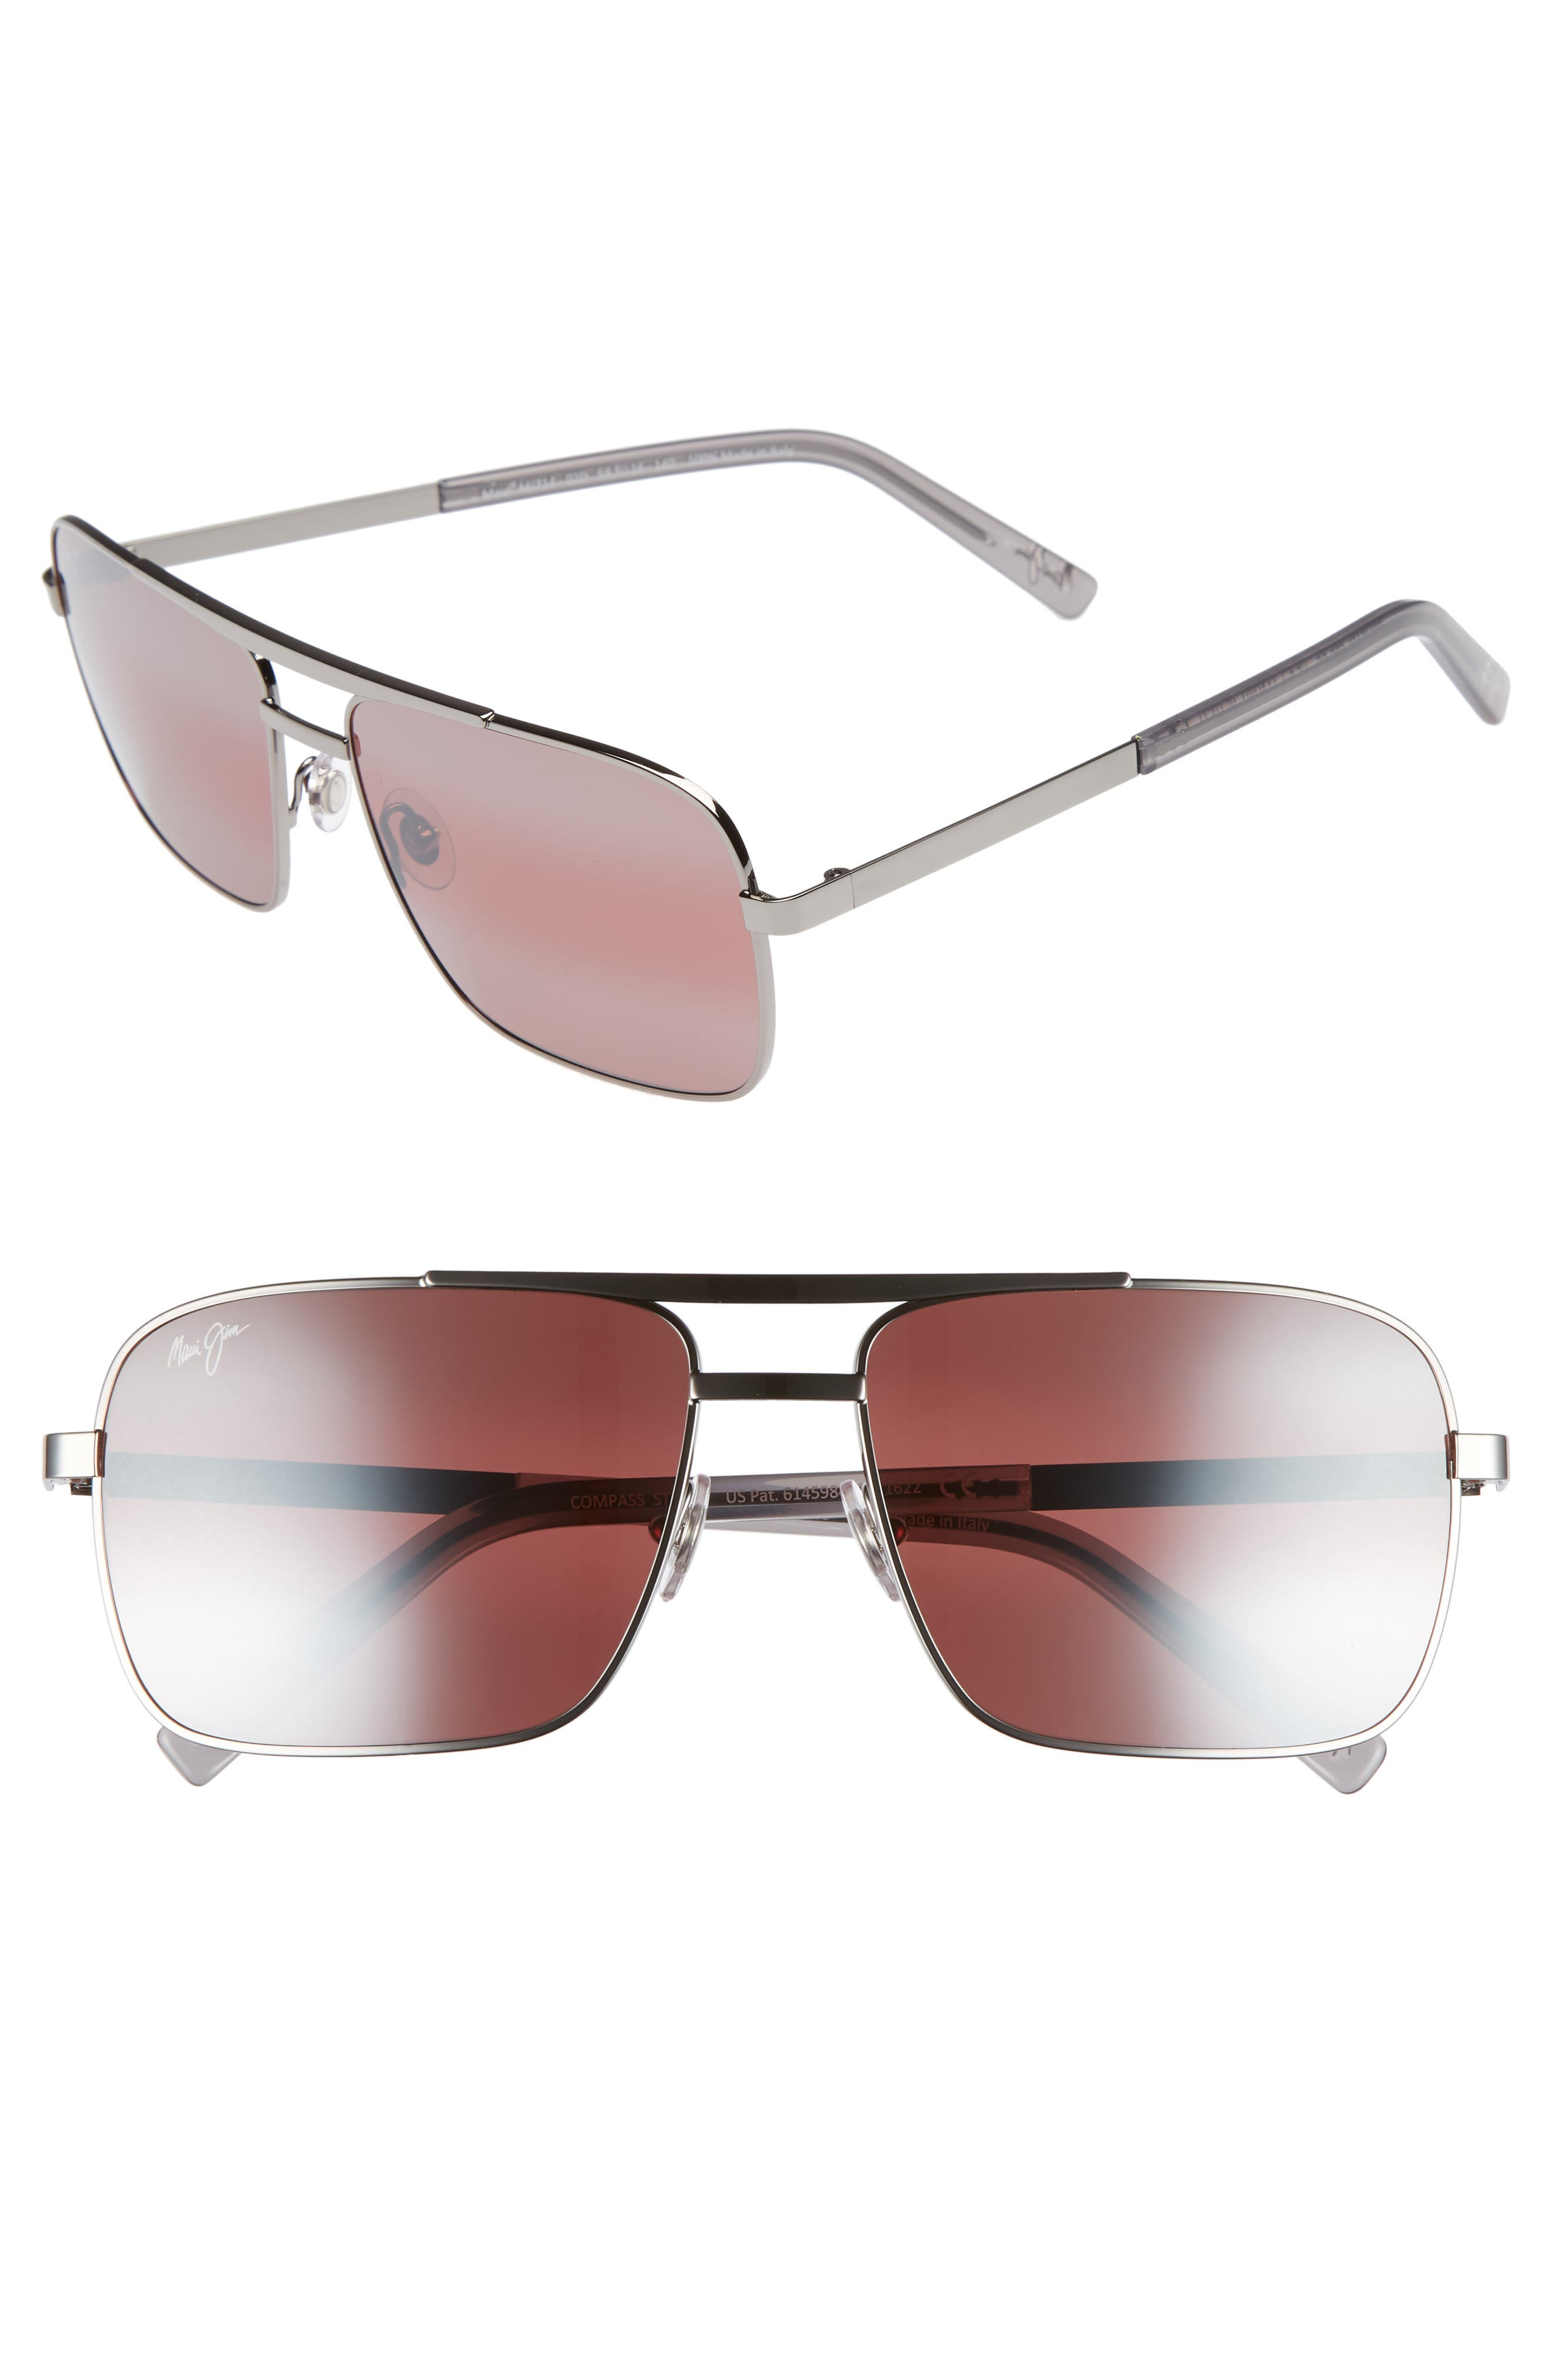 Compass 60mm Polarized Aviator Sunglasses,                         Main,                         color, GUNMETAL/ MAUI ROSE